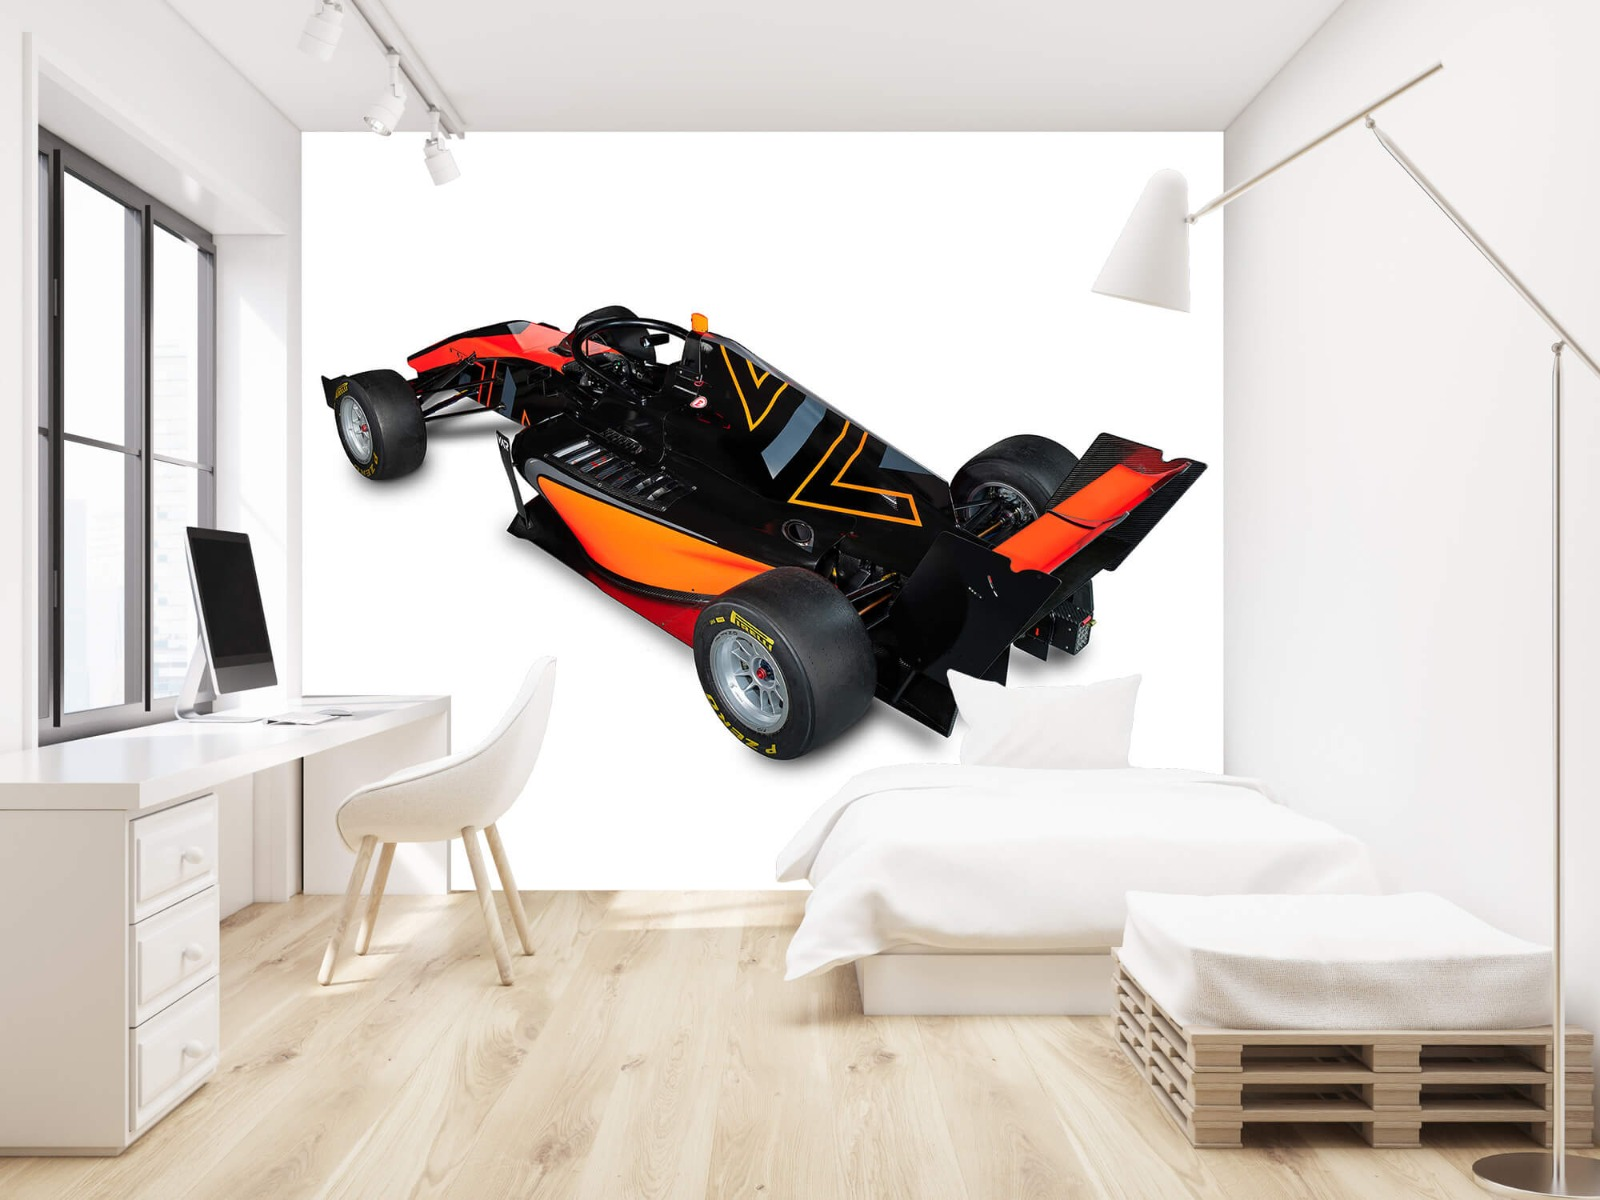 Sportauto's - Formula 3 - Rear left view - Hobbykamer 22